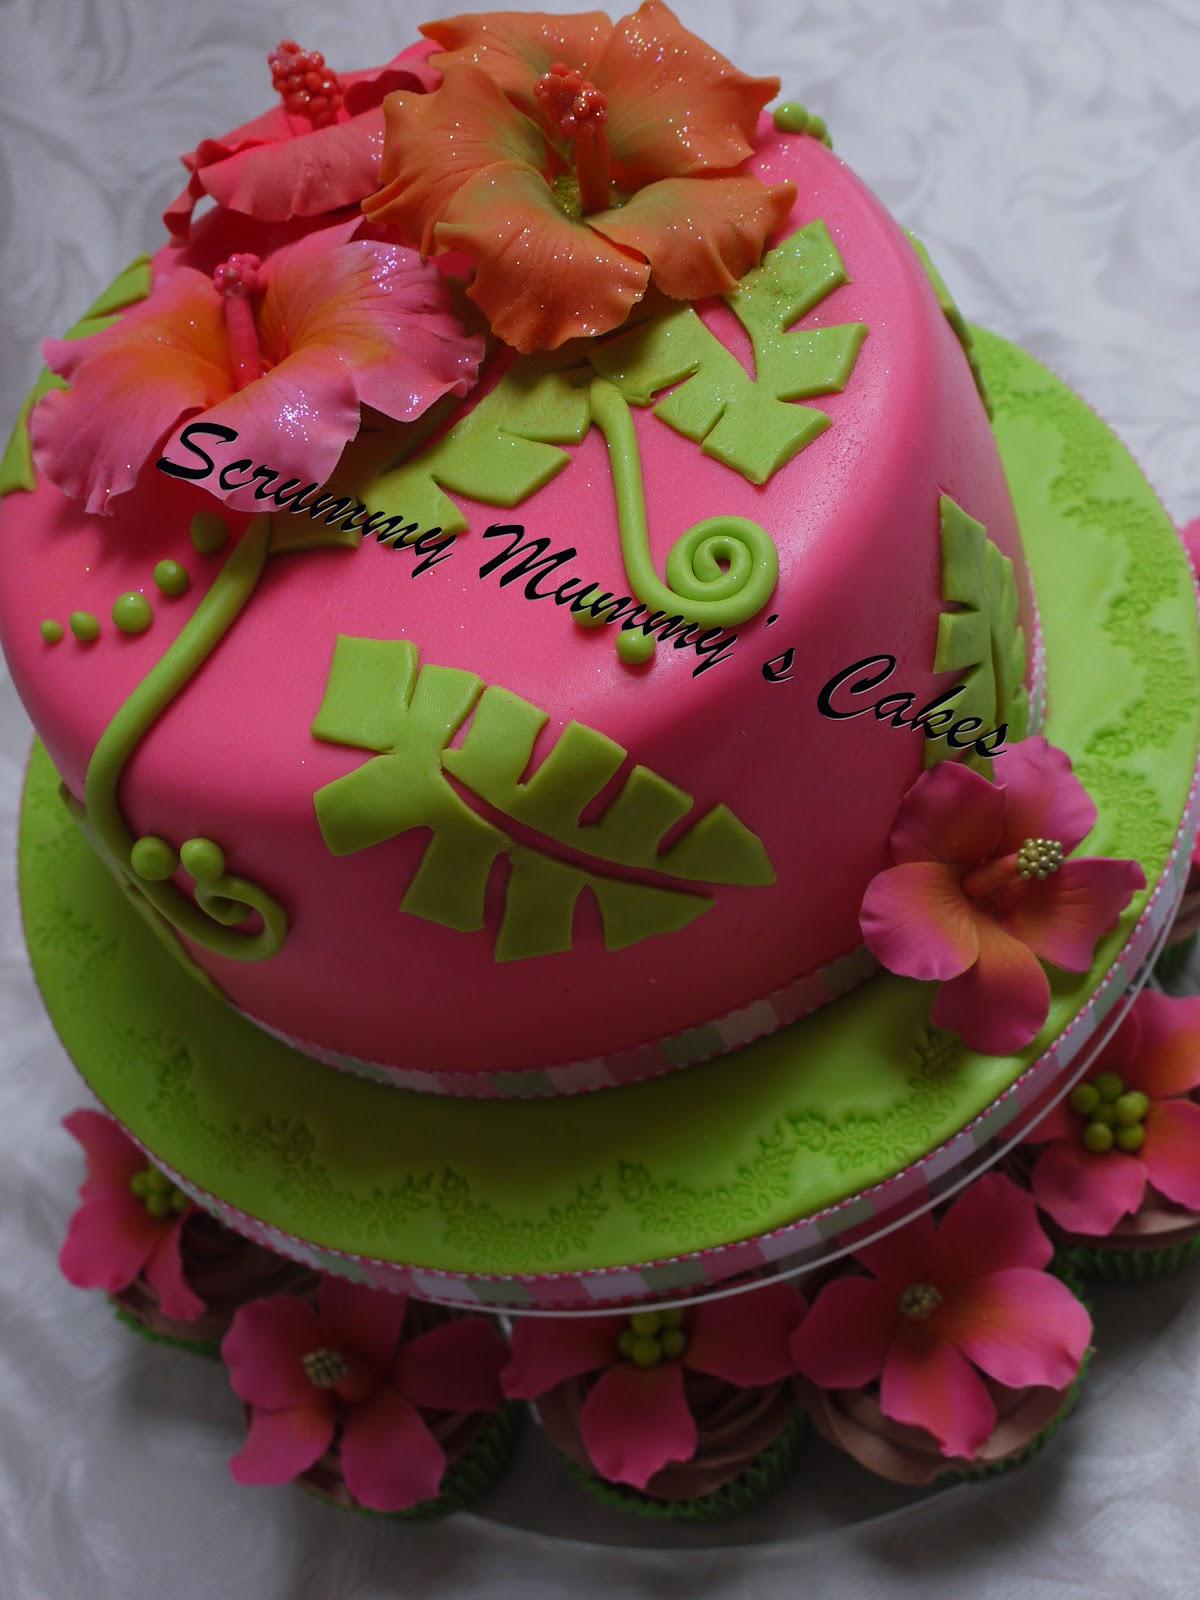 Scrummy Mummy S Cakes Hibiscus Birthday Cake And Cupcakes